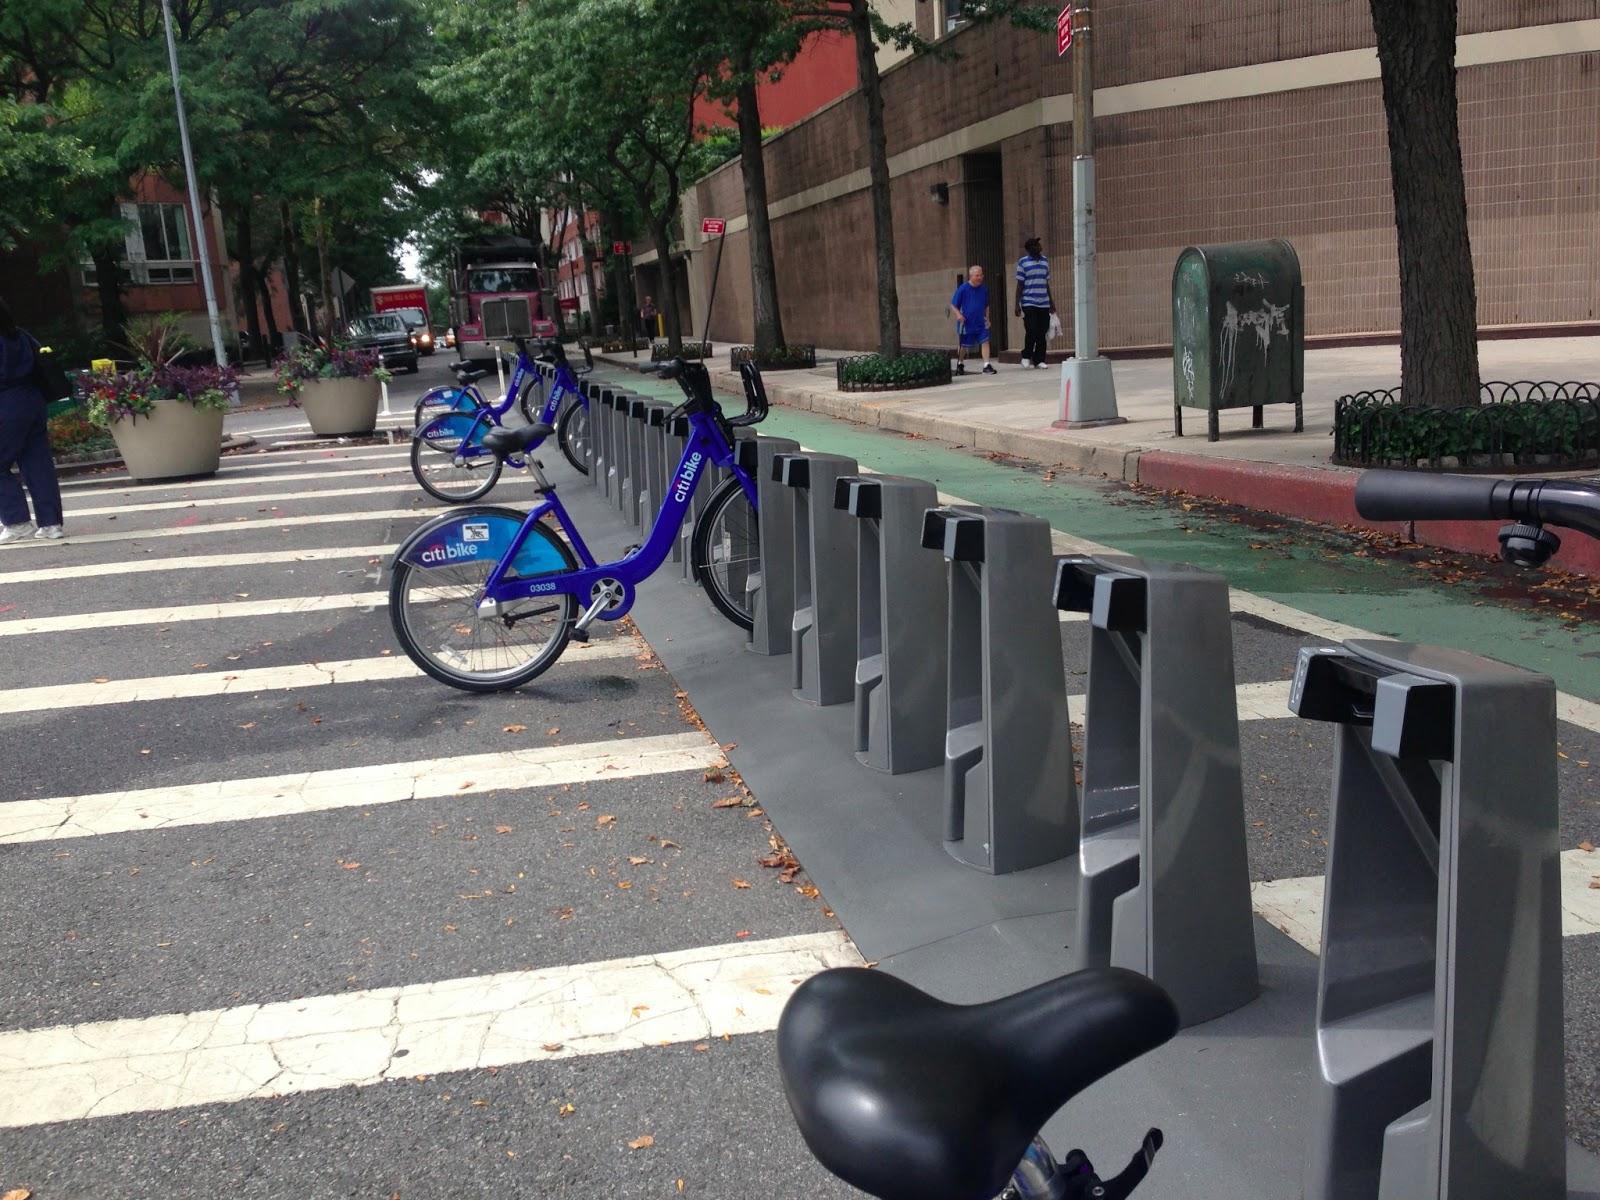 Bike Snob NYC Oopsie Accidentally Purpose